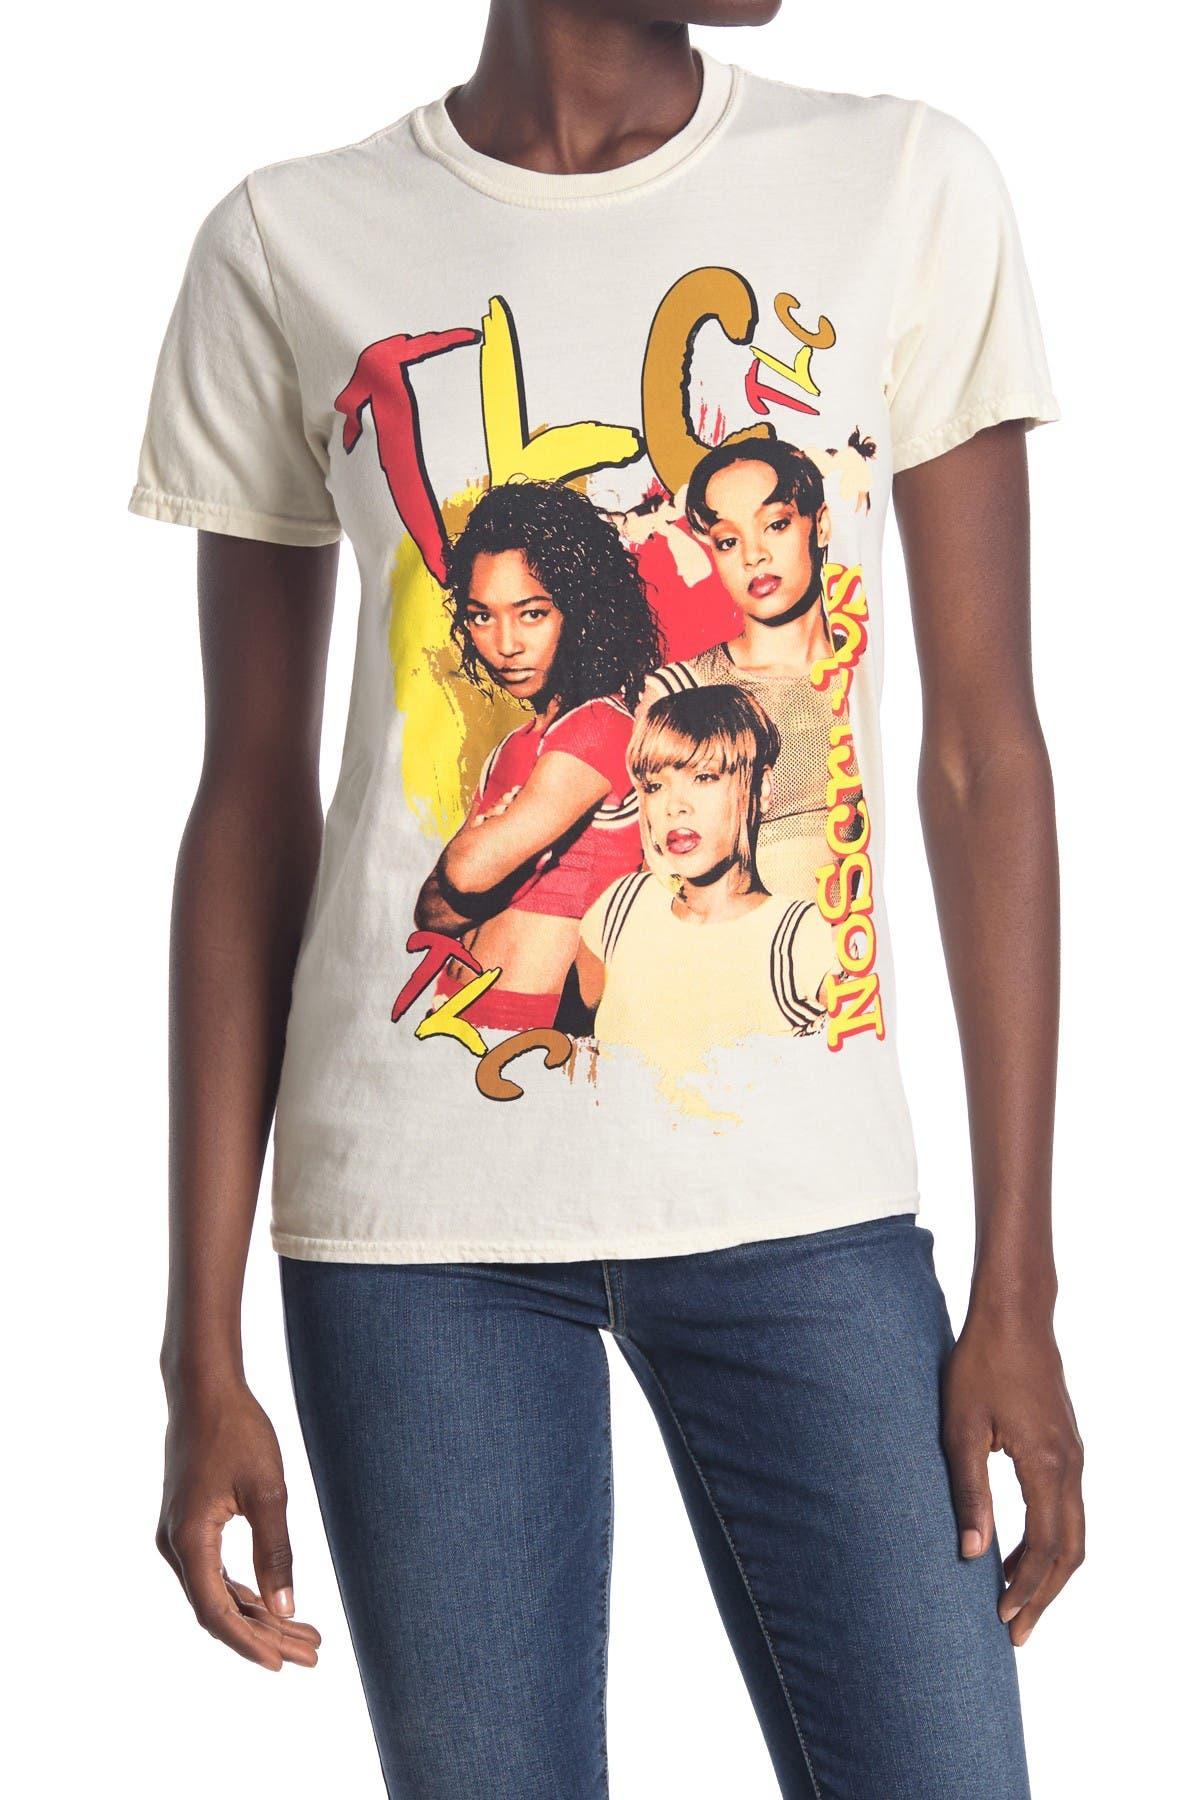 Image of MERCH TRAFFIC TLC Overdye Graphic T-Shirt